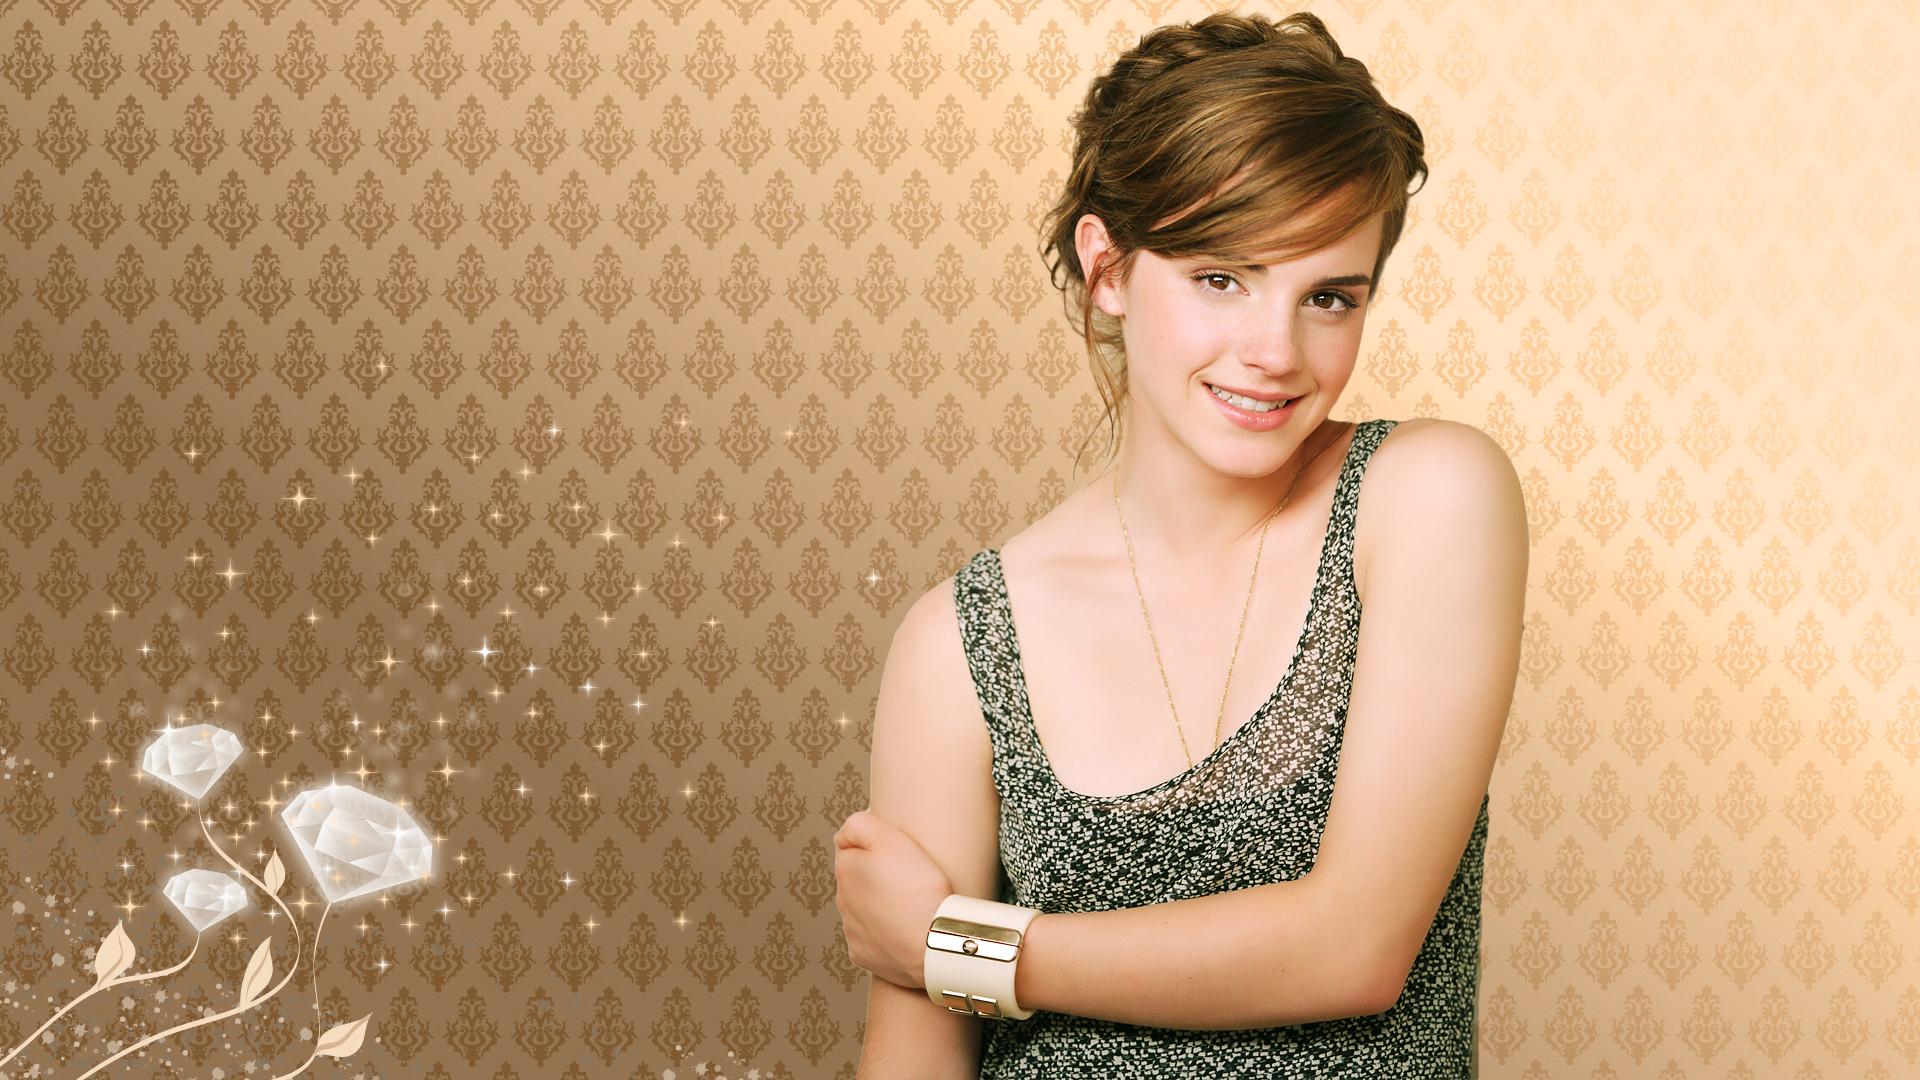 Hd wallpaper emma watson - Emma Watson Hd Wallpaper 2012 Images Amp Pictures Becuo